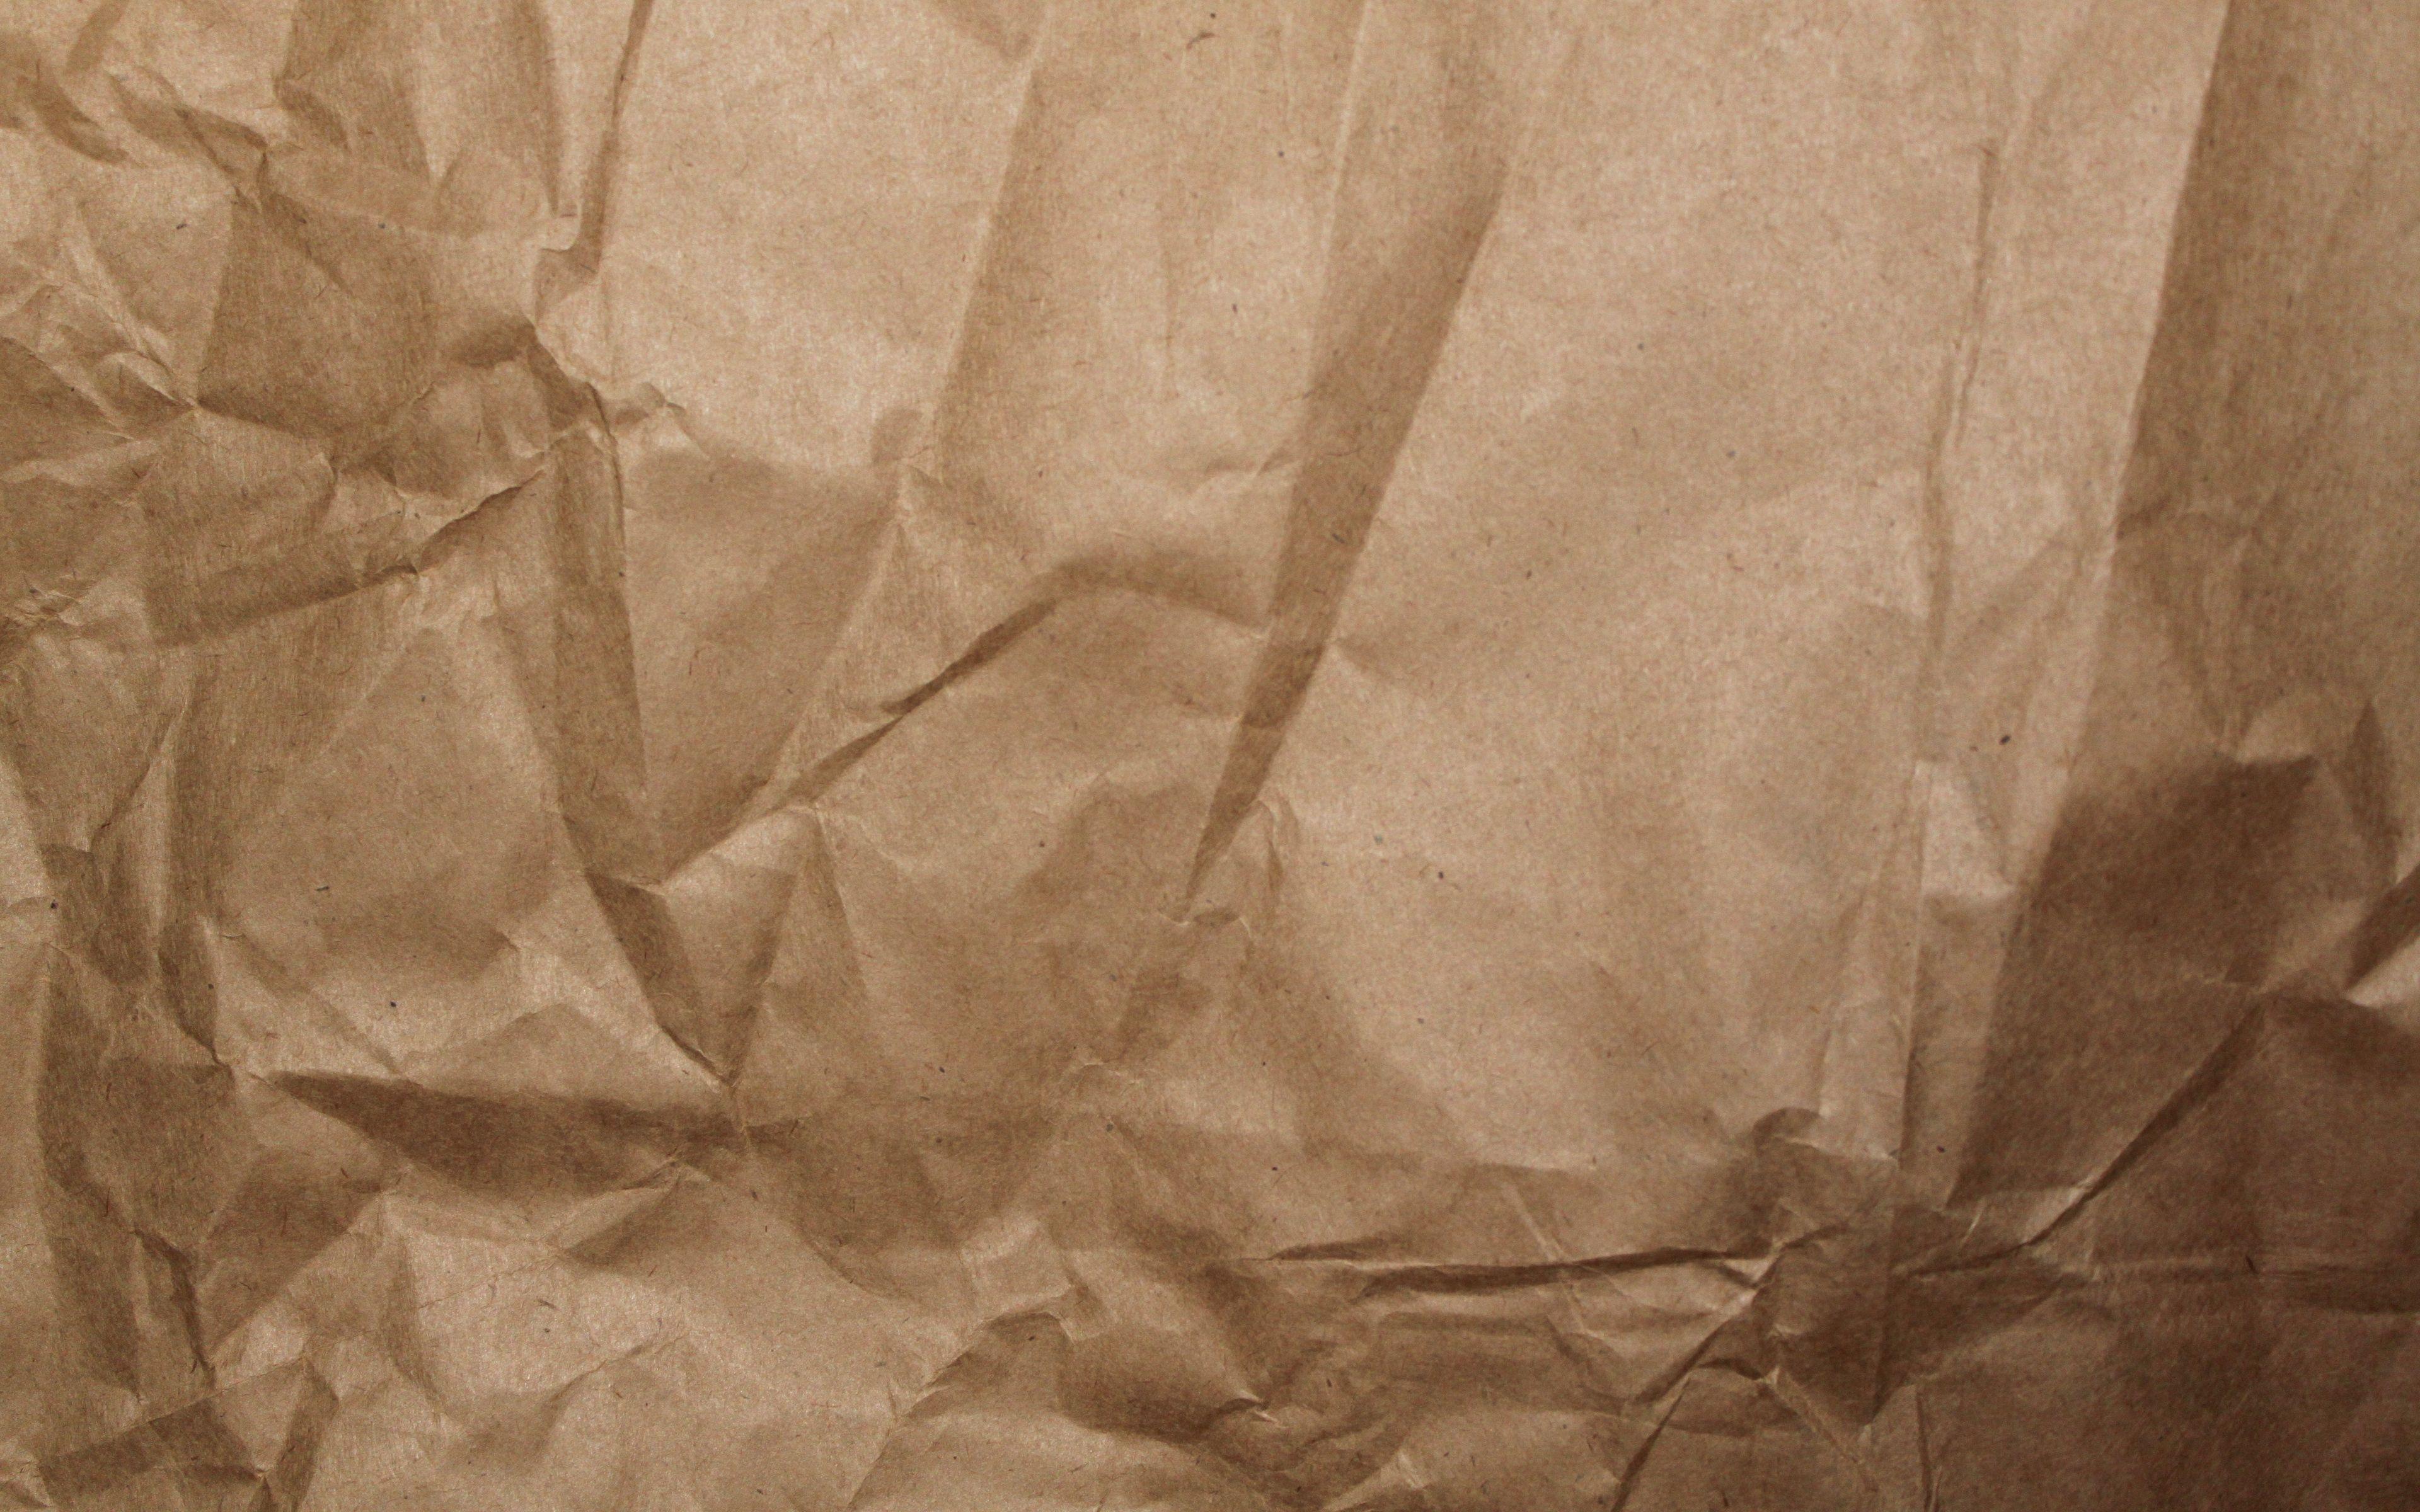 4k纹理素材无水印壁纸图